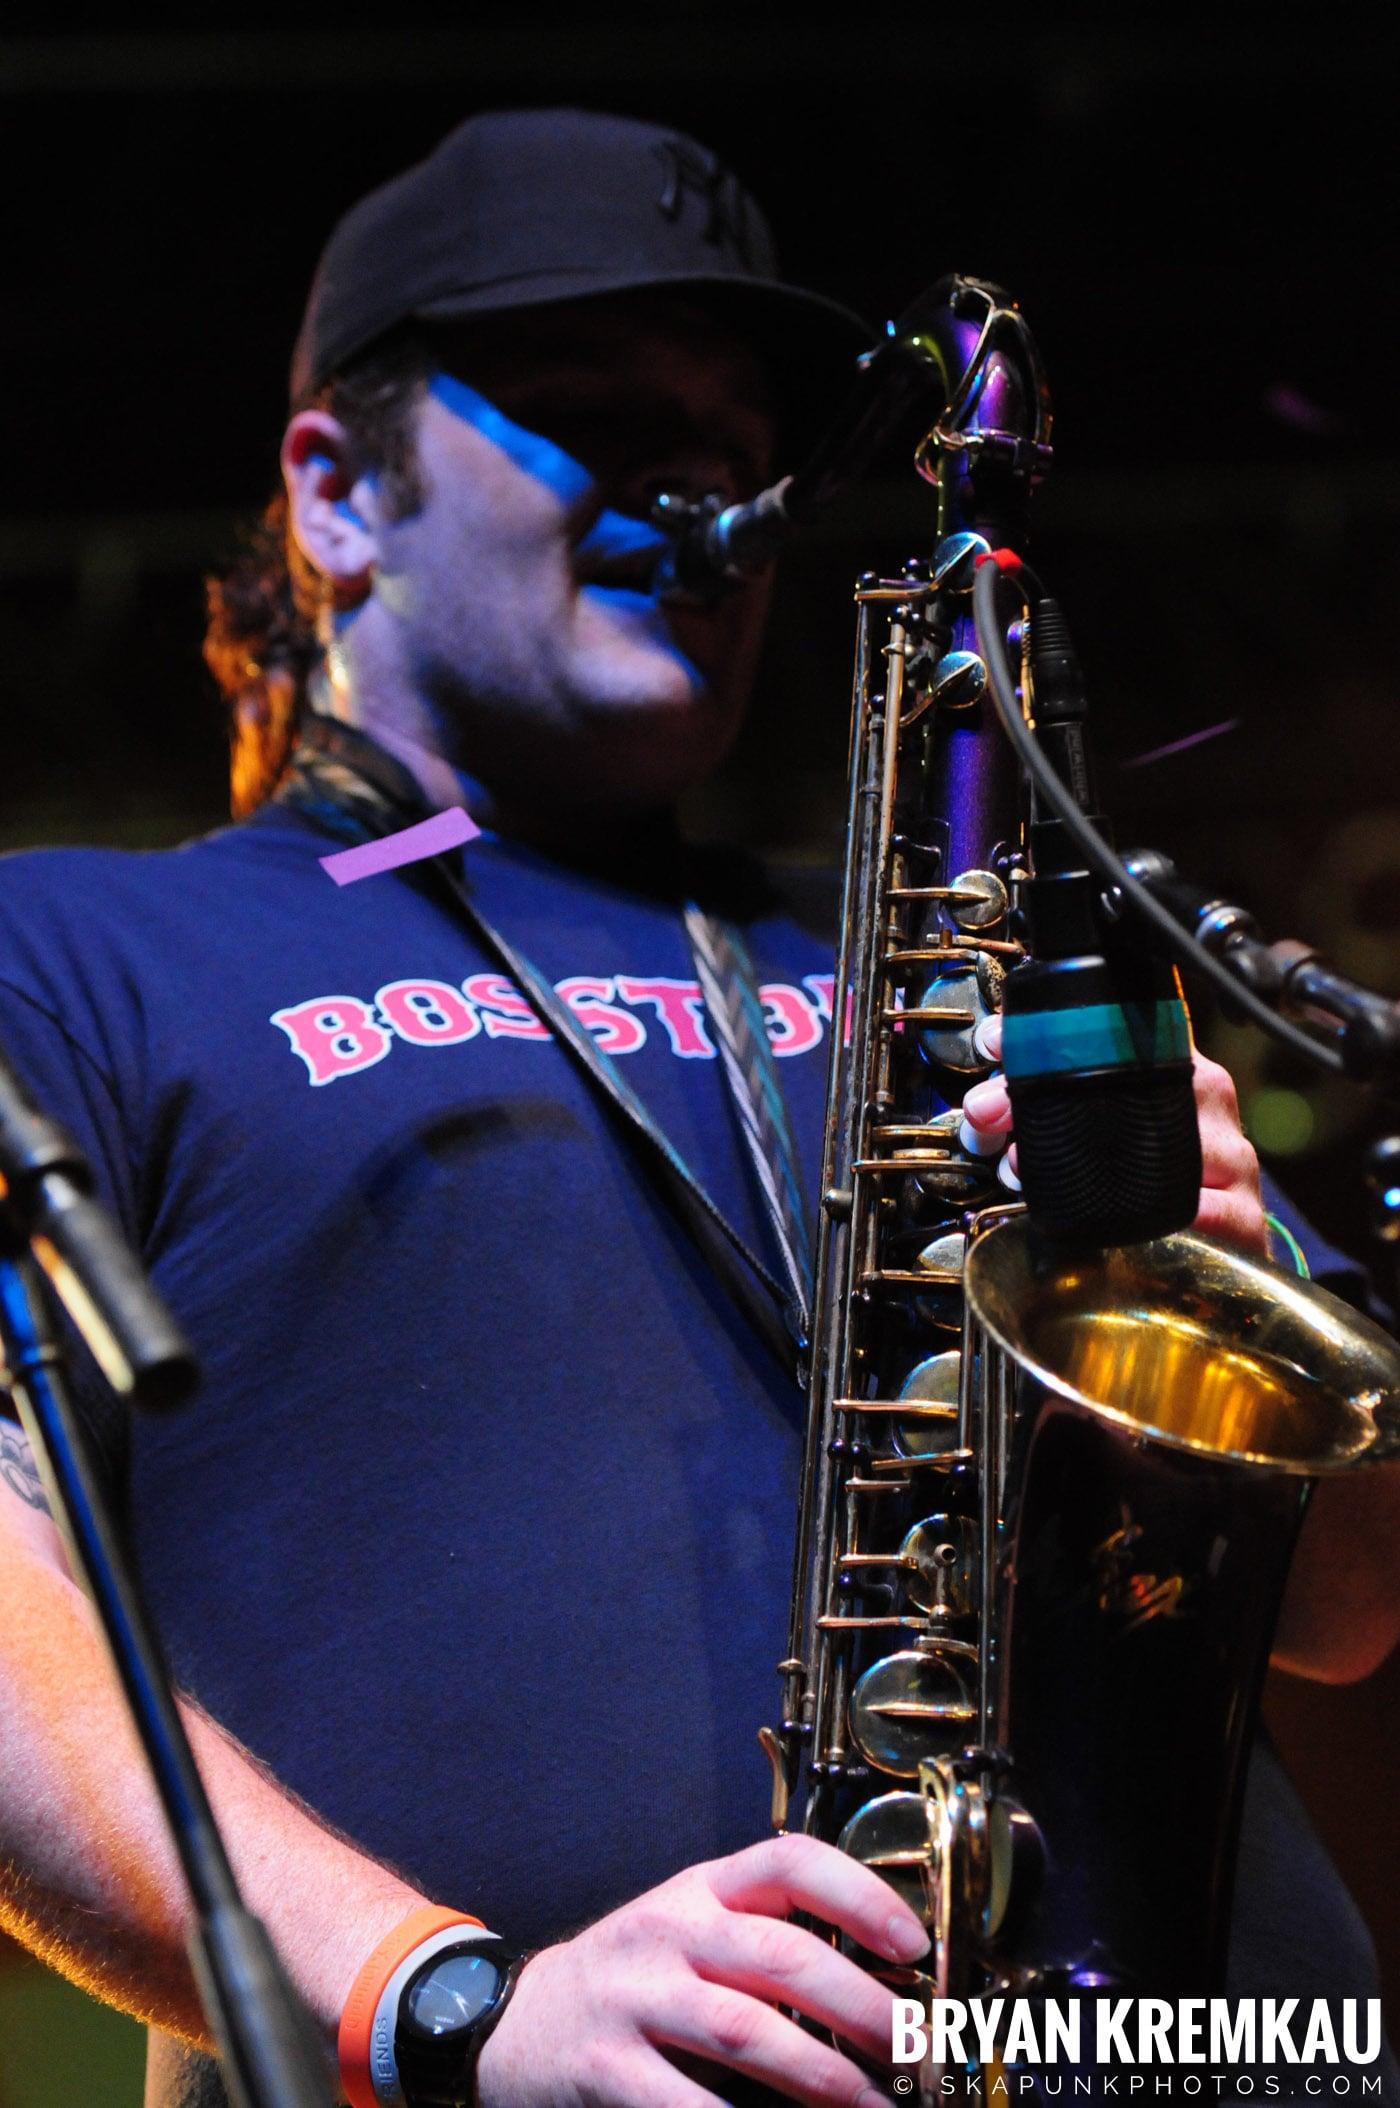 Less Than Jake @ Roseland Ballroom, NYC - 6.26.08 (8)